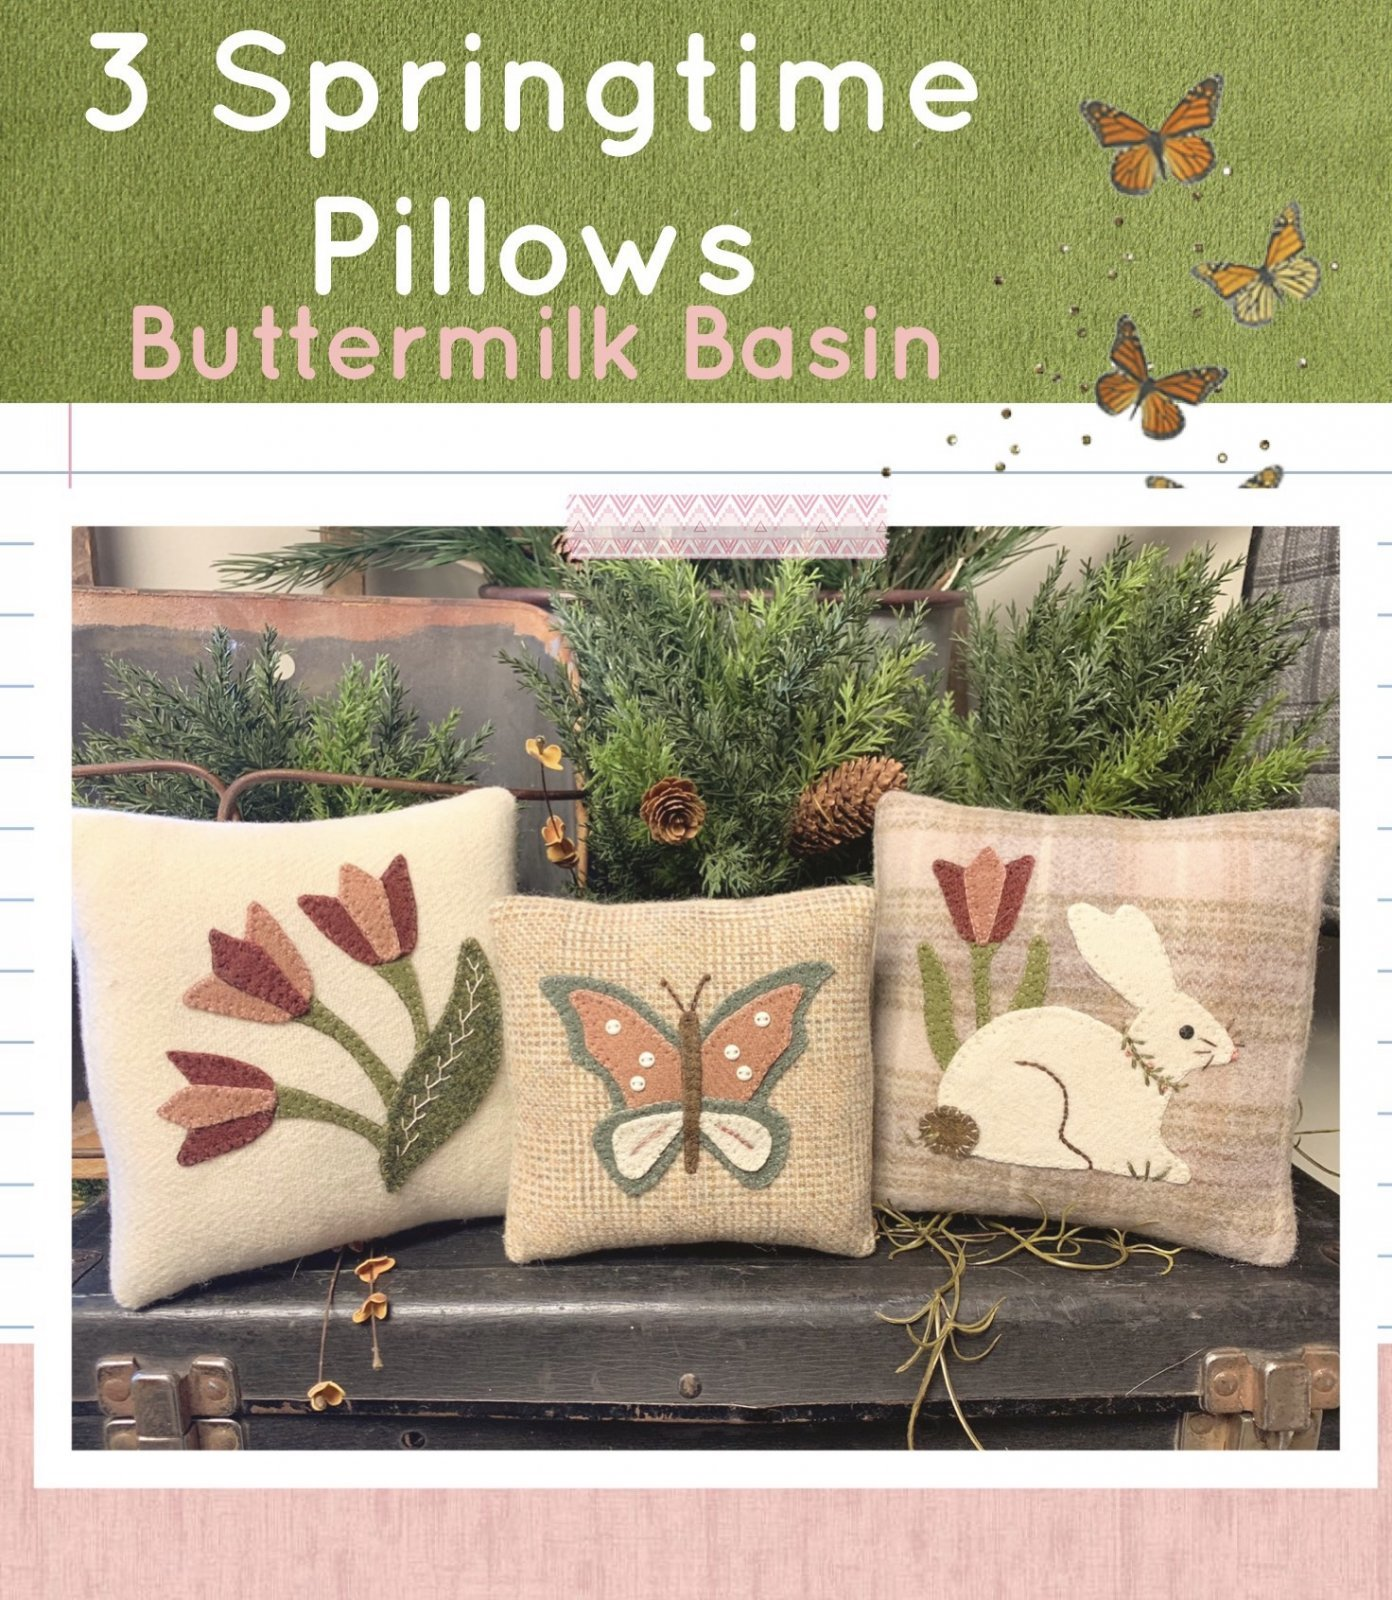 3 Springtime Pillows